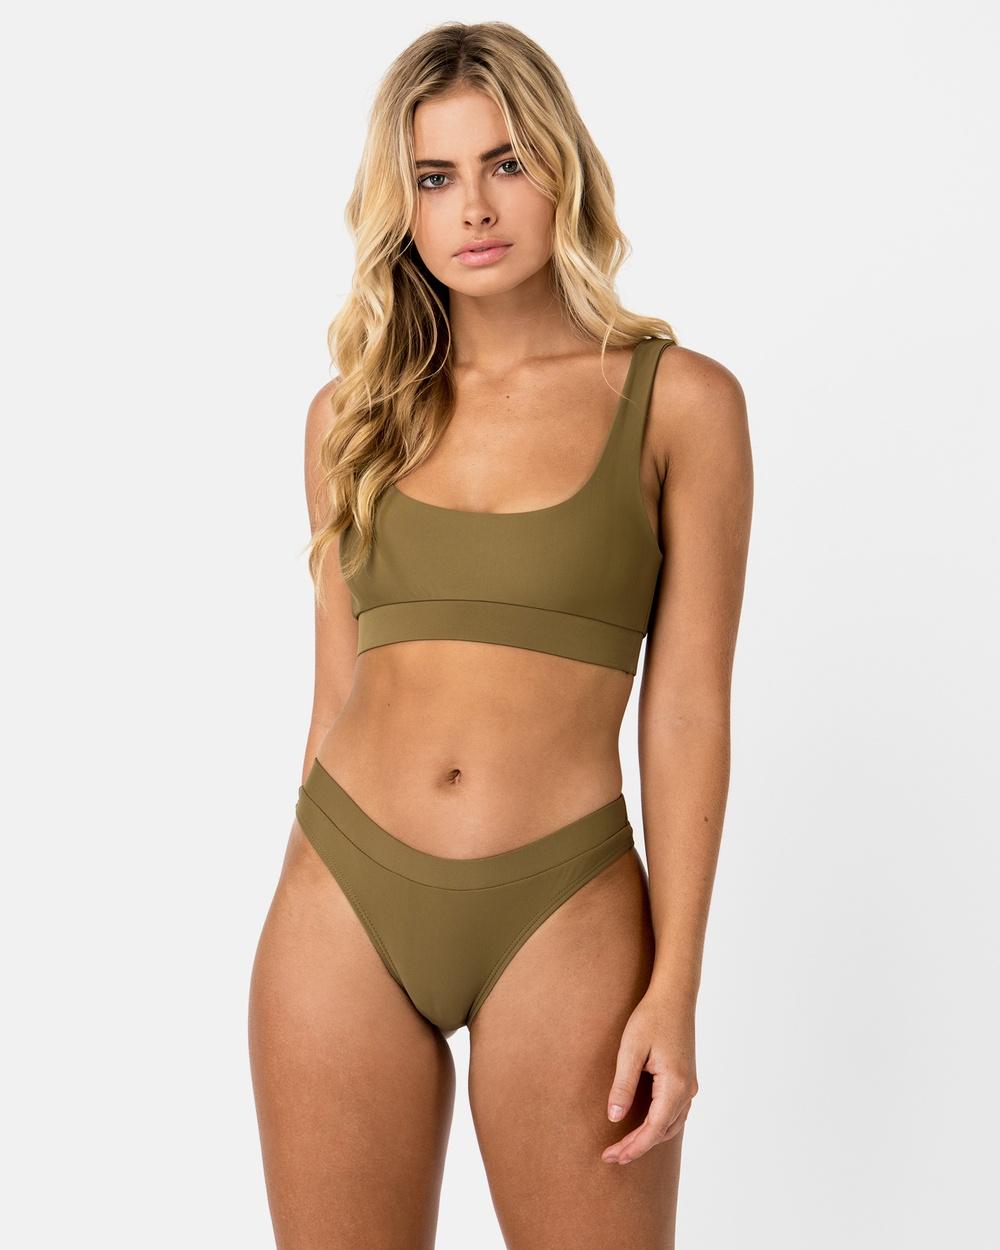 Cali Rae Ecuador Bikini Bottoms Bikini Bottoms Green Ecuador Bikini Bottoms